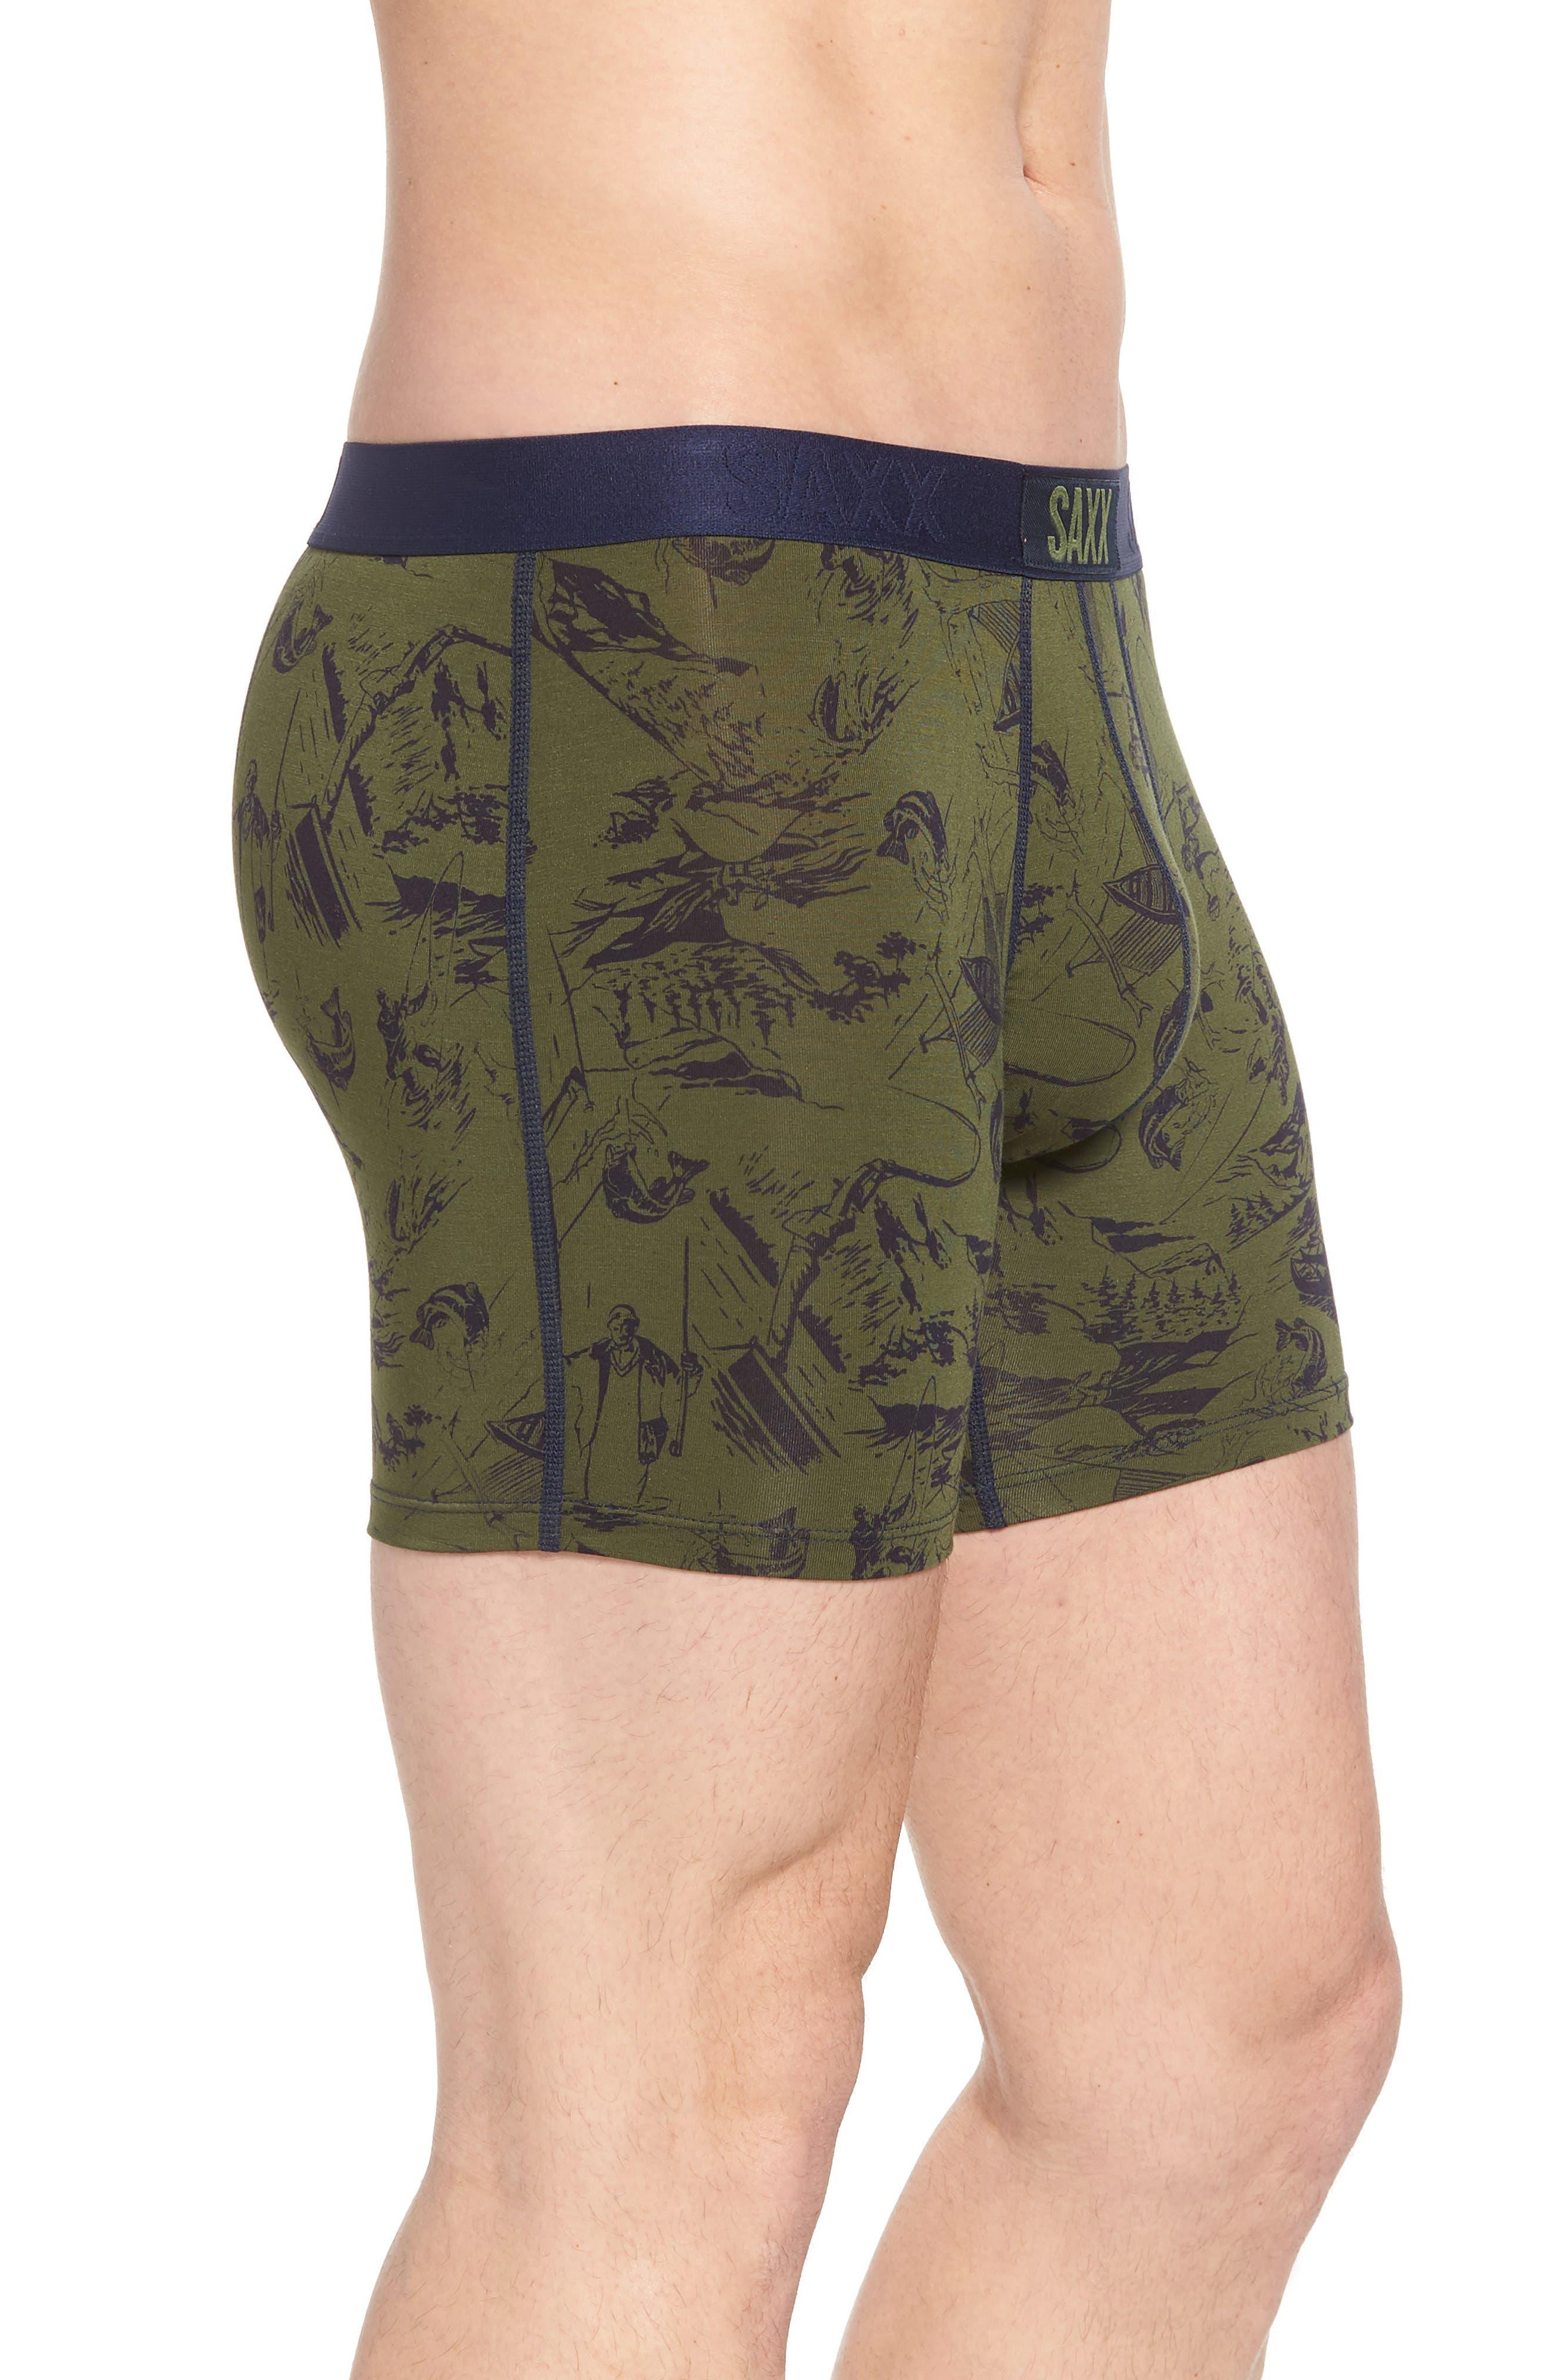 Vibe Stretch Boxer Briefs,                             Alternate thumbnail 3, color,                             Green Fisherman